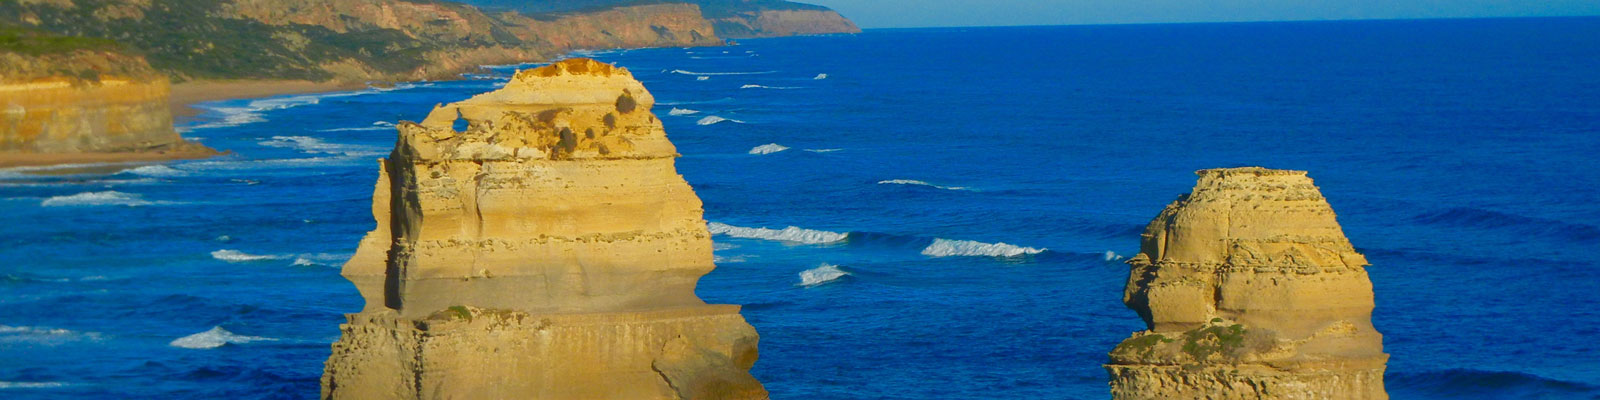 Oceania Vegan Travel Guides